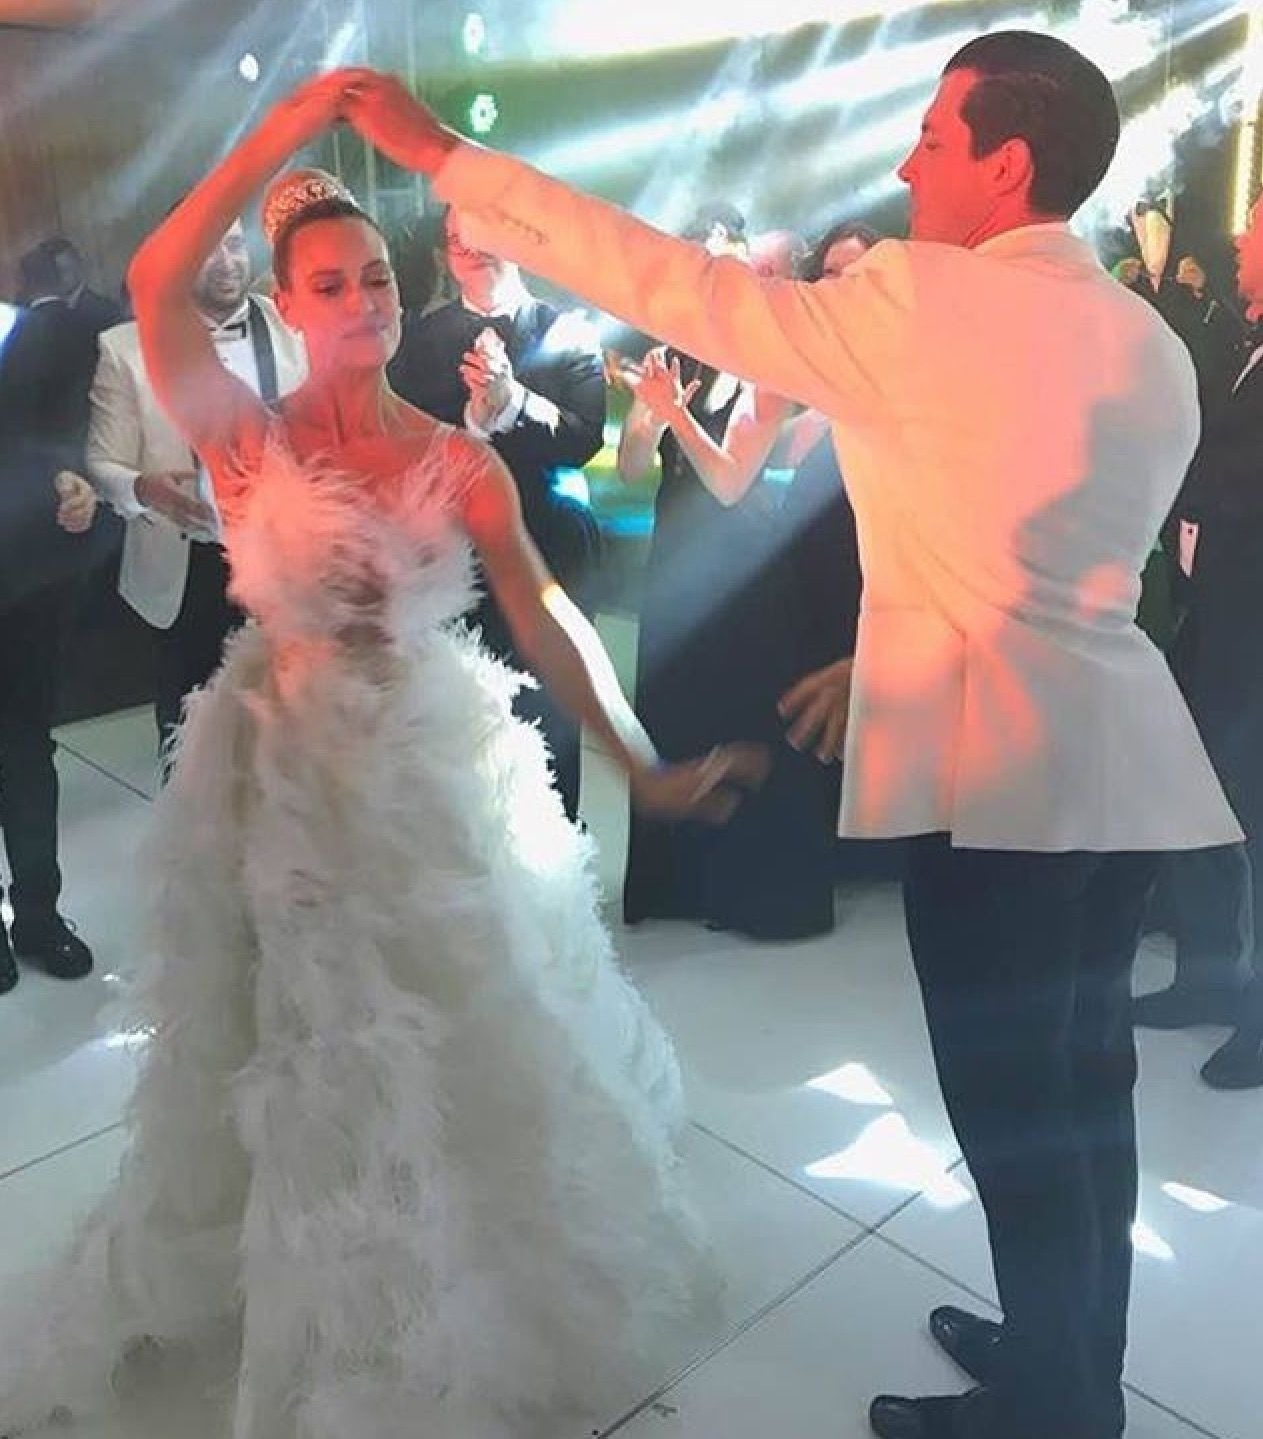 Ginger zee wedding dress  Pin by mary tull on maks and peta  Pinterest  PETA